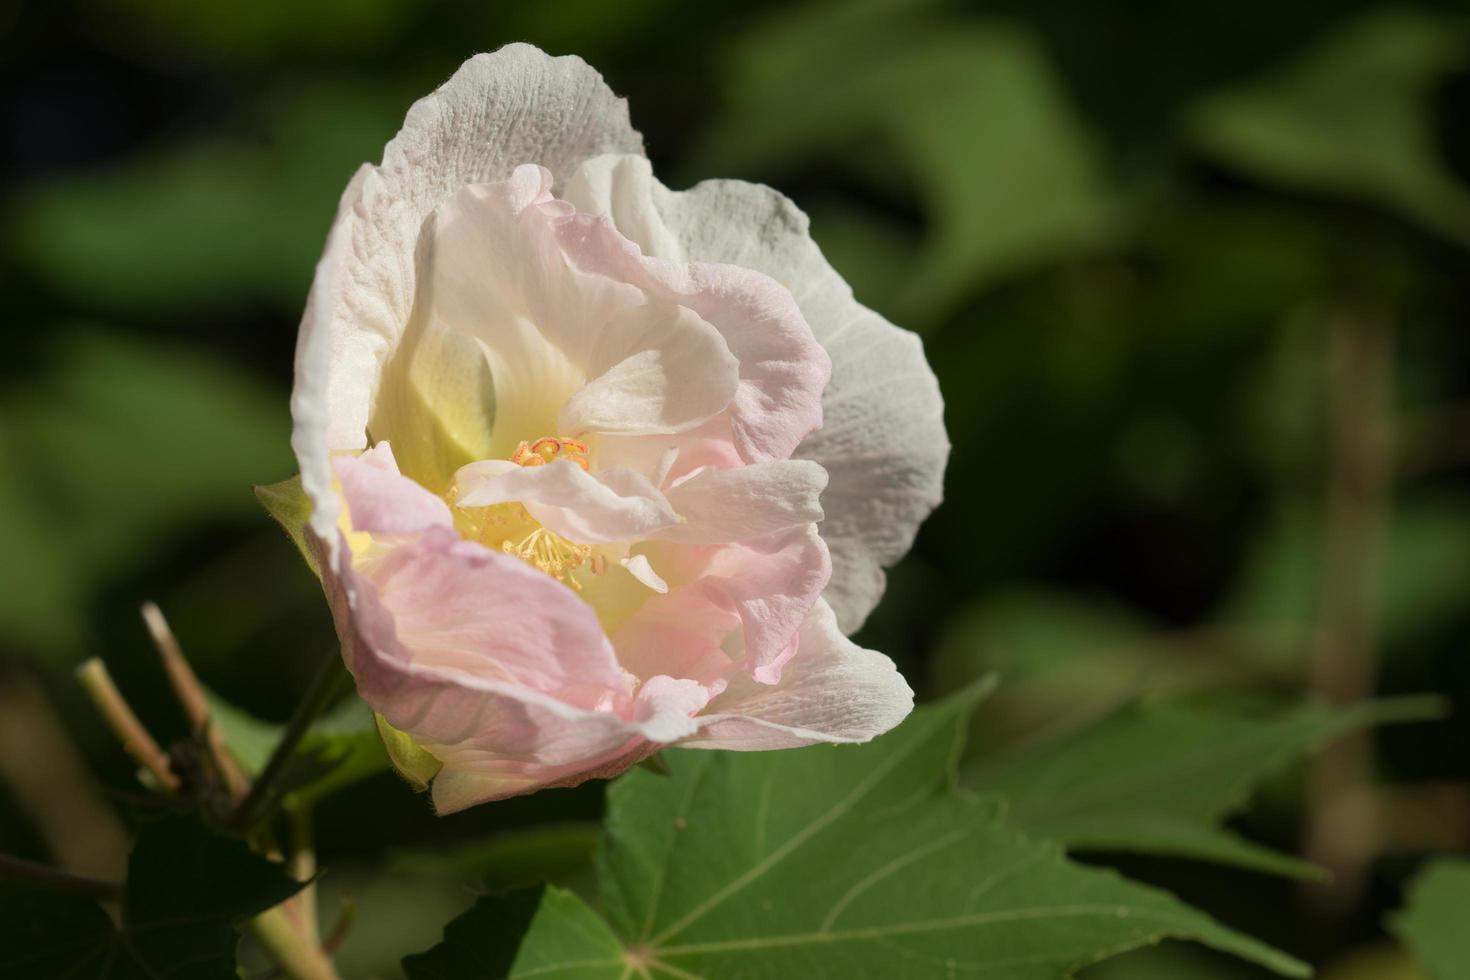 roze crème grote bloem van hibiscus foto